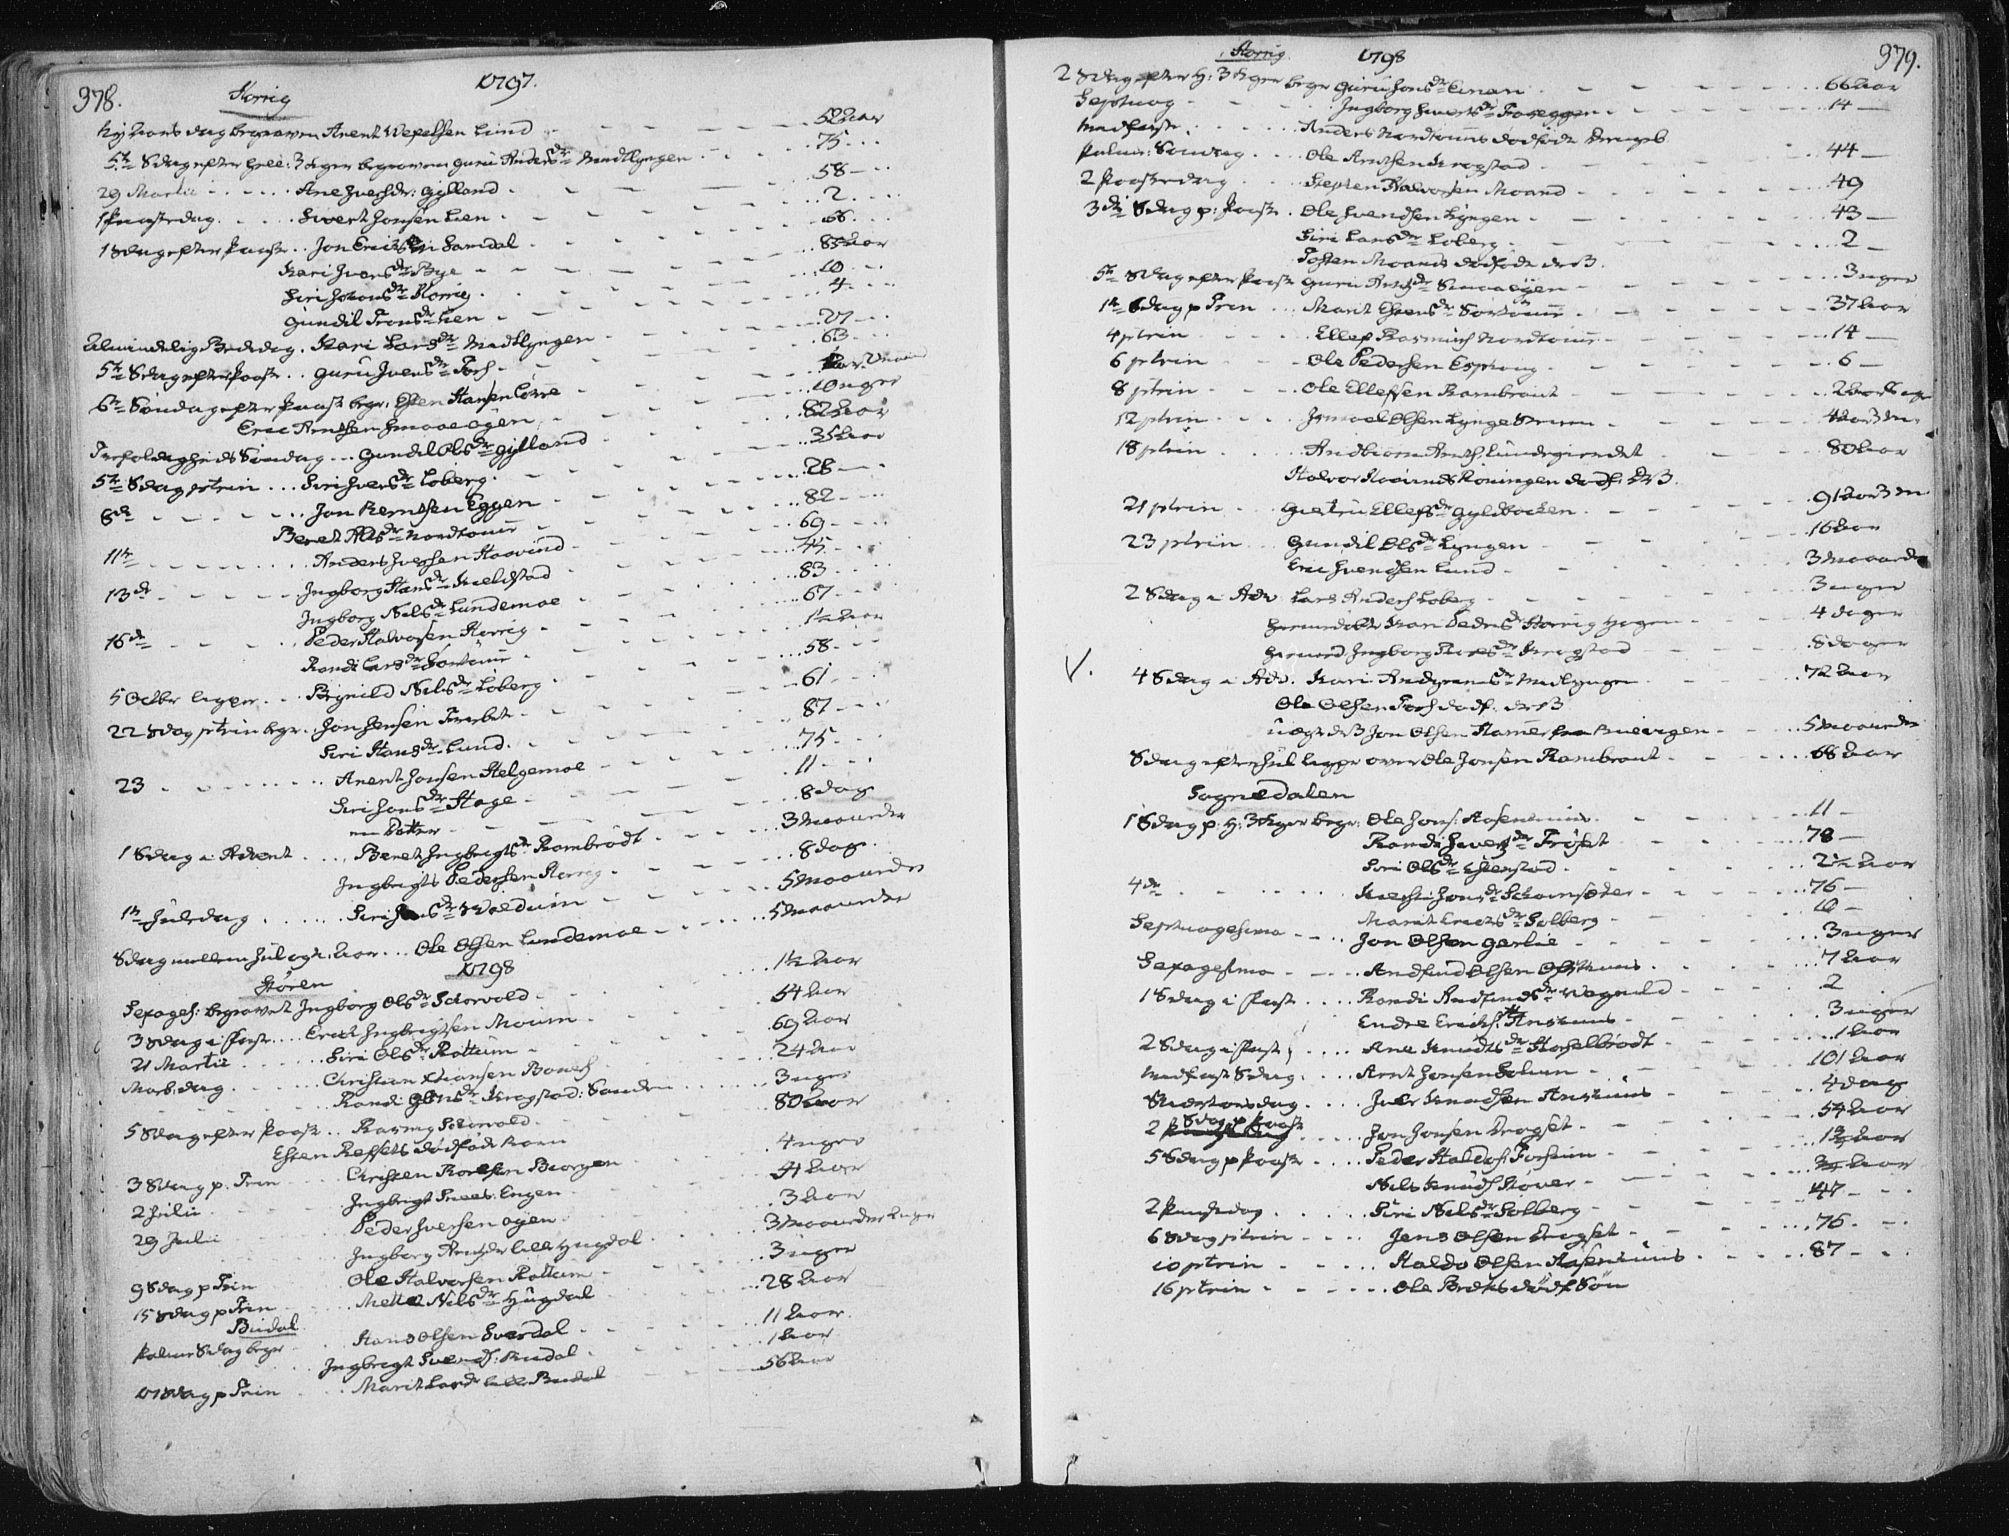 SAT, Ministerialprotokoller, klokkerbøker og fødselsregistre - Sør-Trøndelag, 687/L0992: Parish register (official) no. 687A03 /1, 1788-1815, p. 378-379